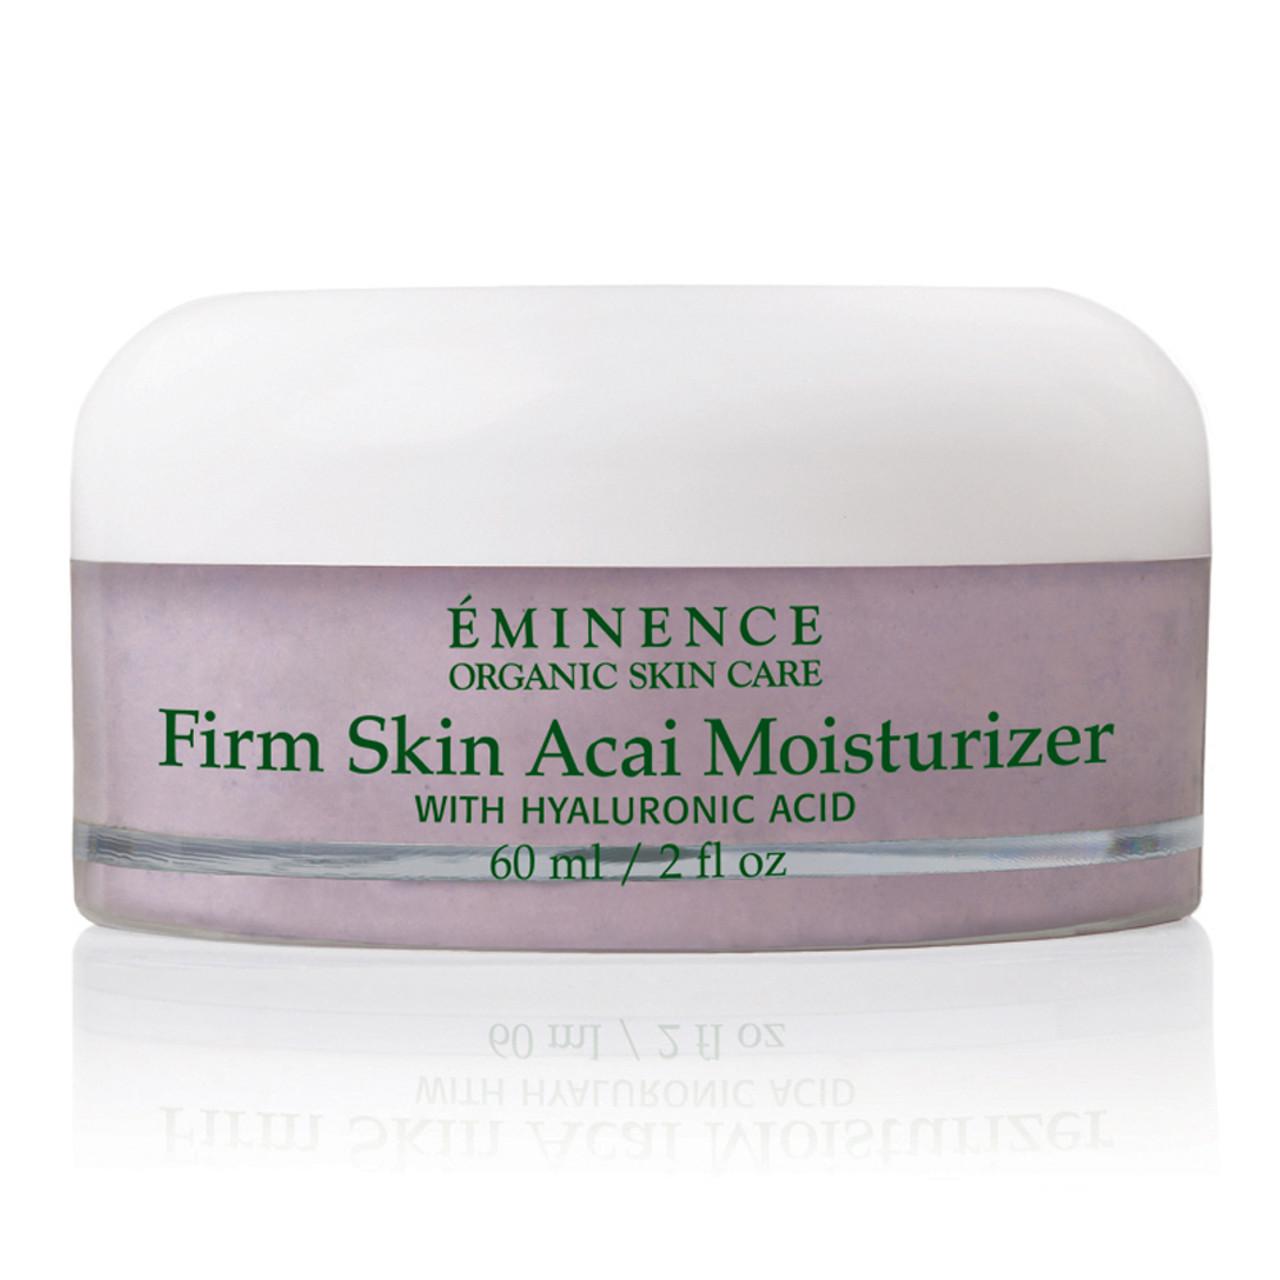 Eminence Firm Skin Acai Moisturizer